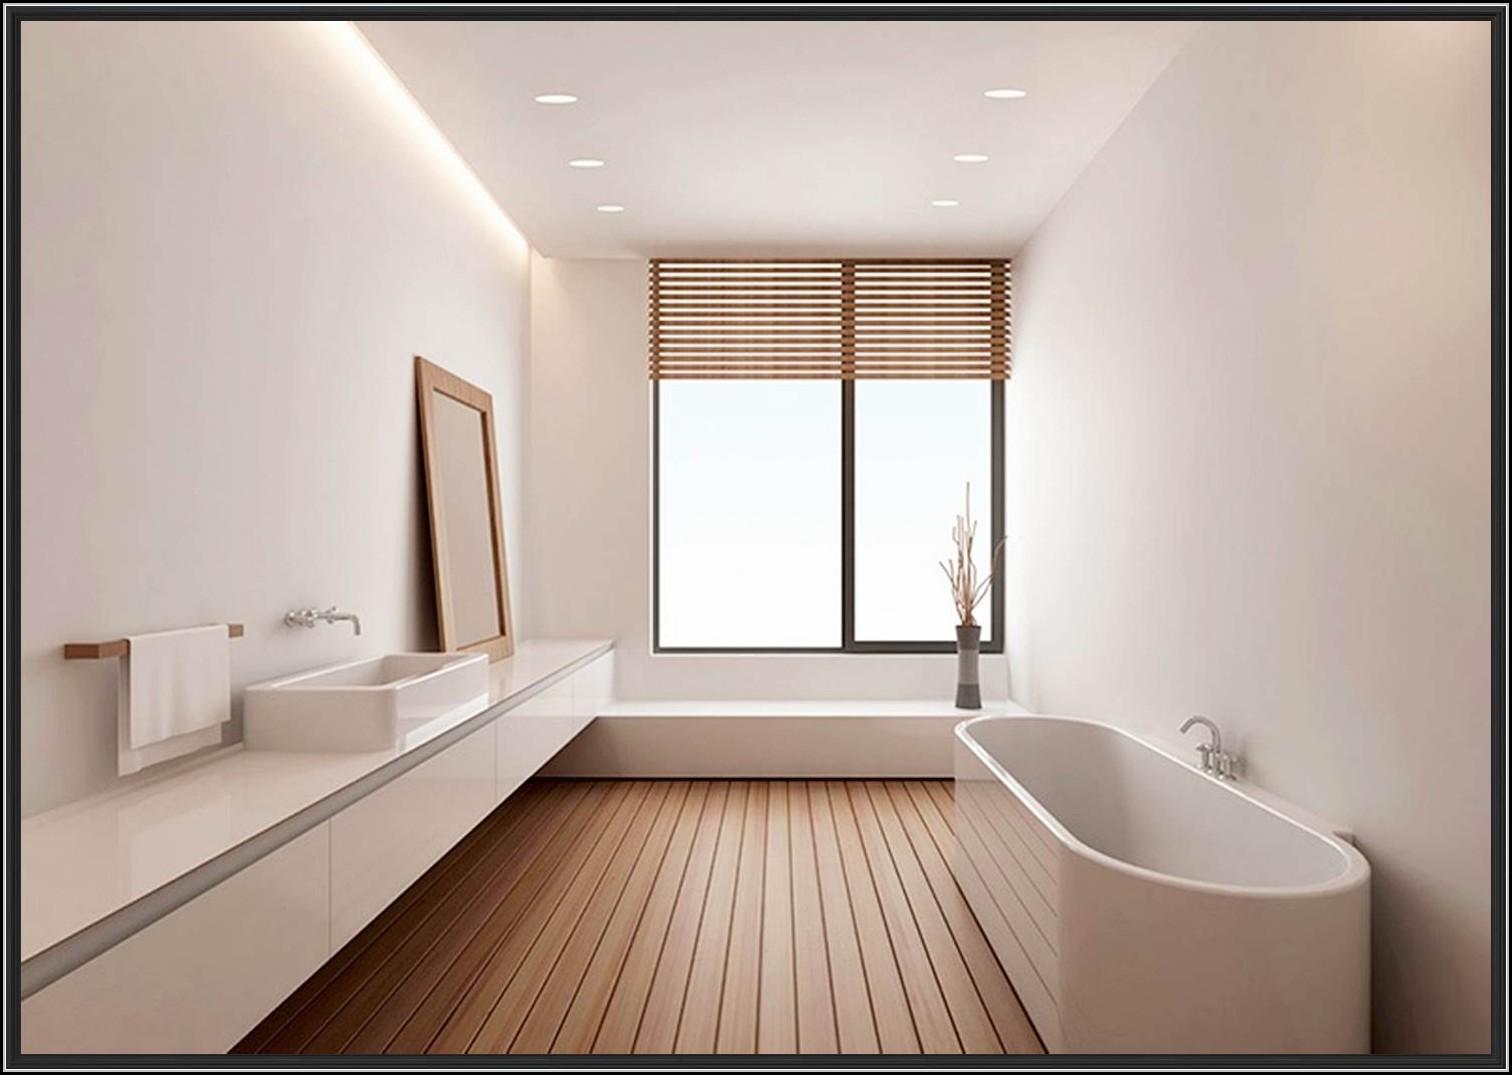 badezimmer beleuchtung decke beleuchthung house und. Black Bedroom Furniture Sets. Home Design Ideas